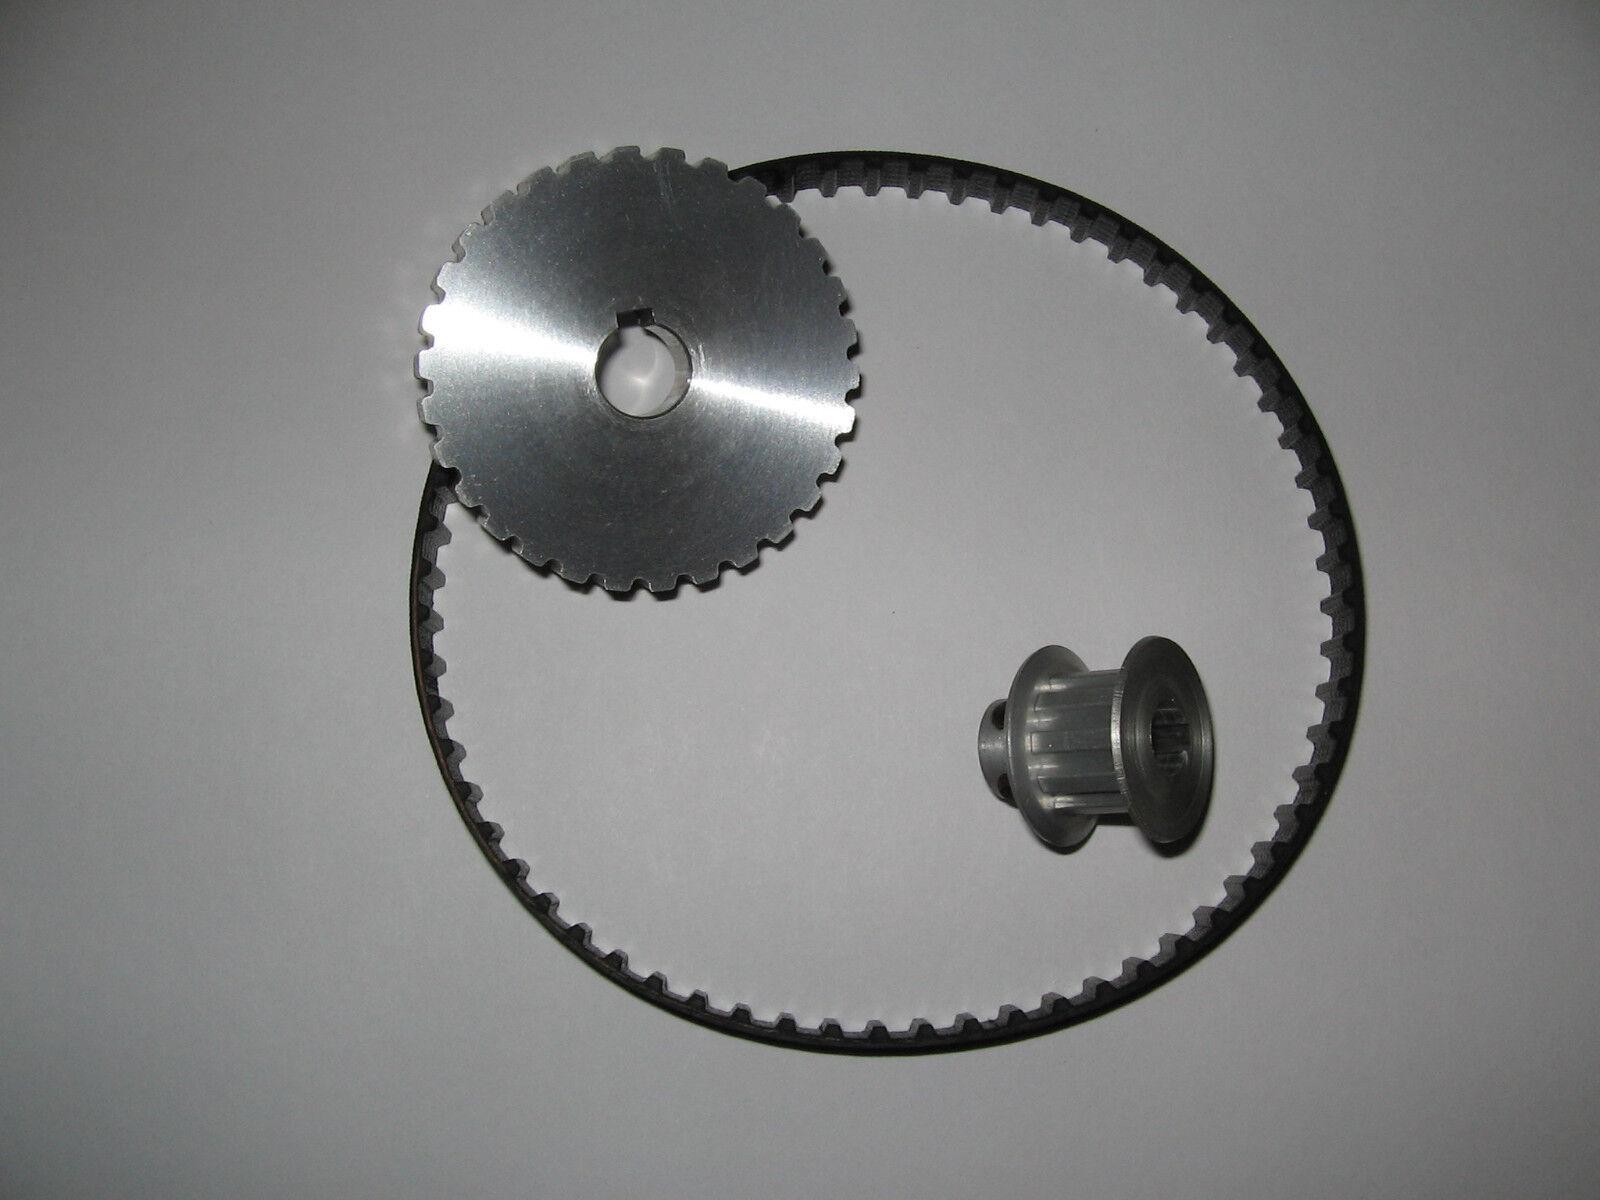 *New BELT*  Central Machinery 33684-9UKA 7x10 Mini Lathe Speedway Series